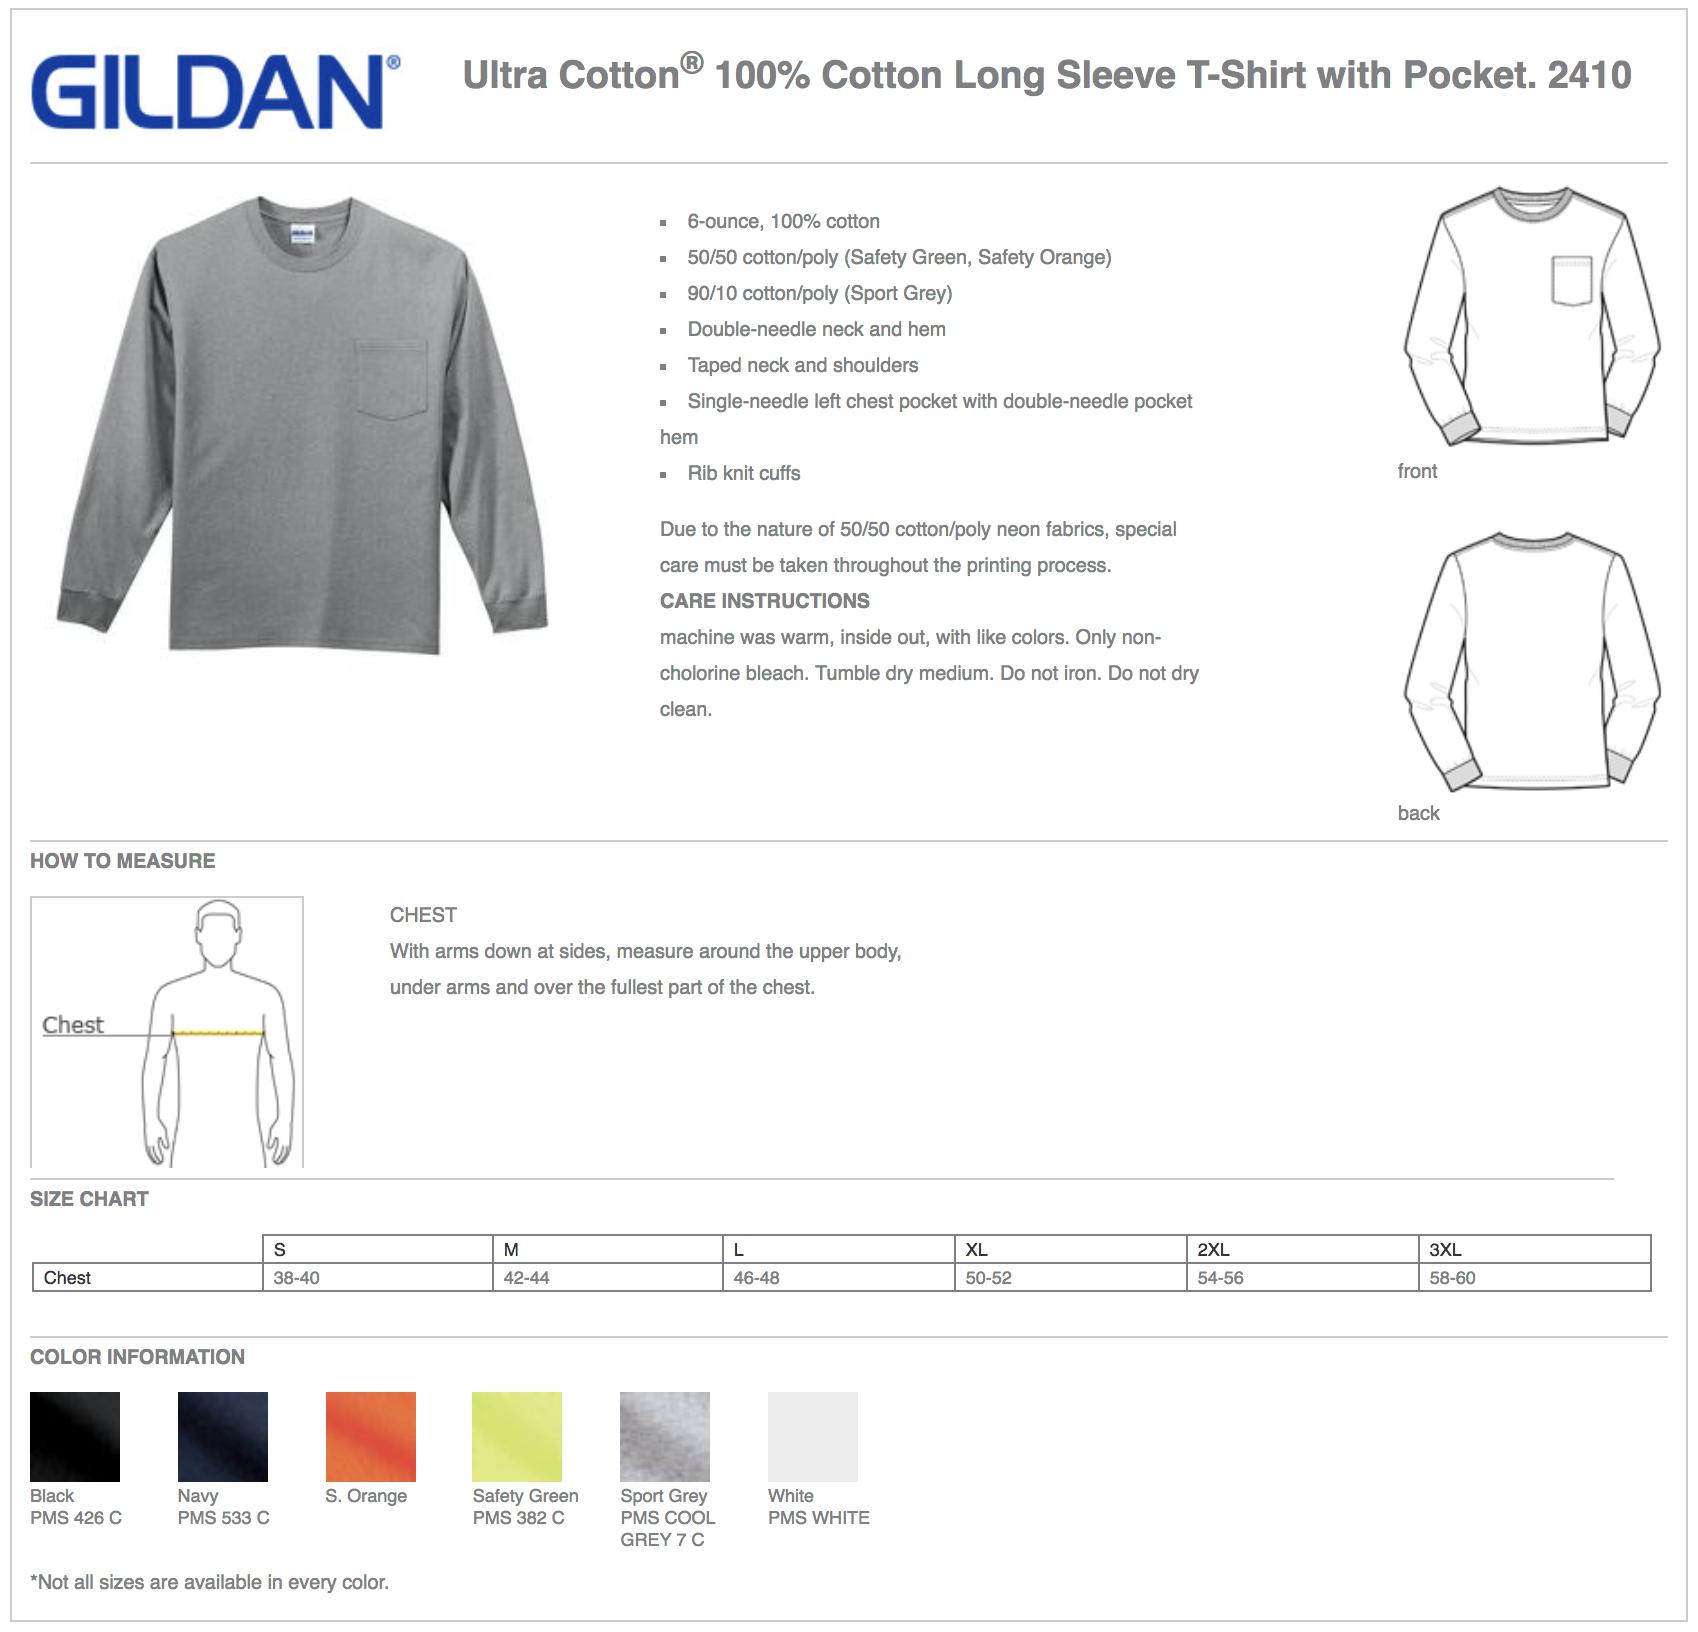 Gildan 2410 Custom Long Sleeve T-Shirts with Pocket